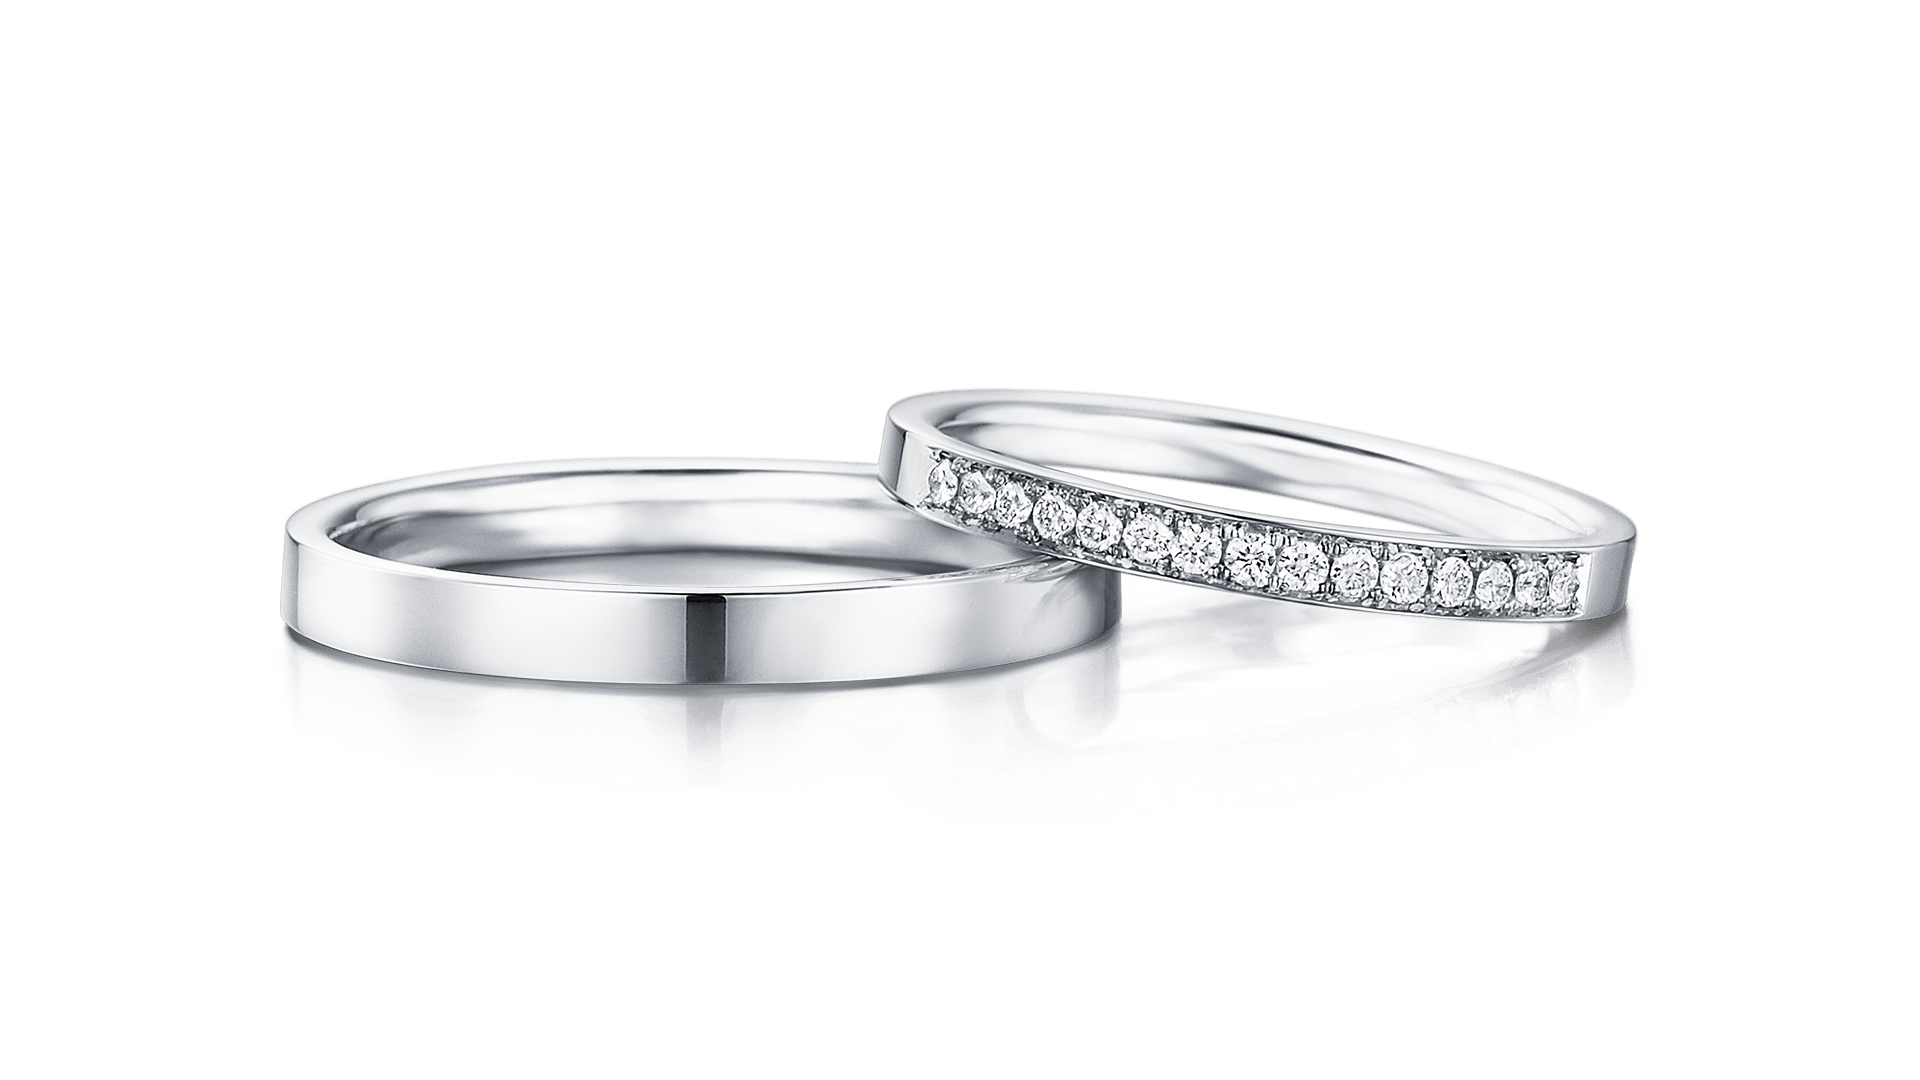 epona エポナ | 結婚指輪サムネイル 1